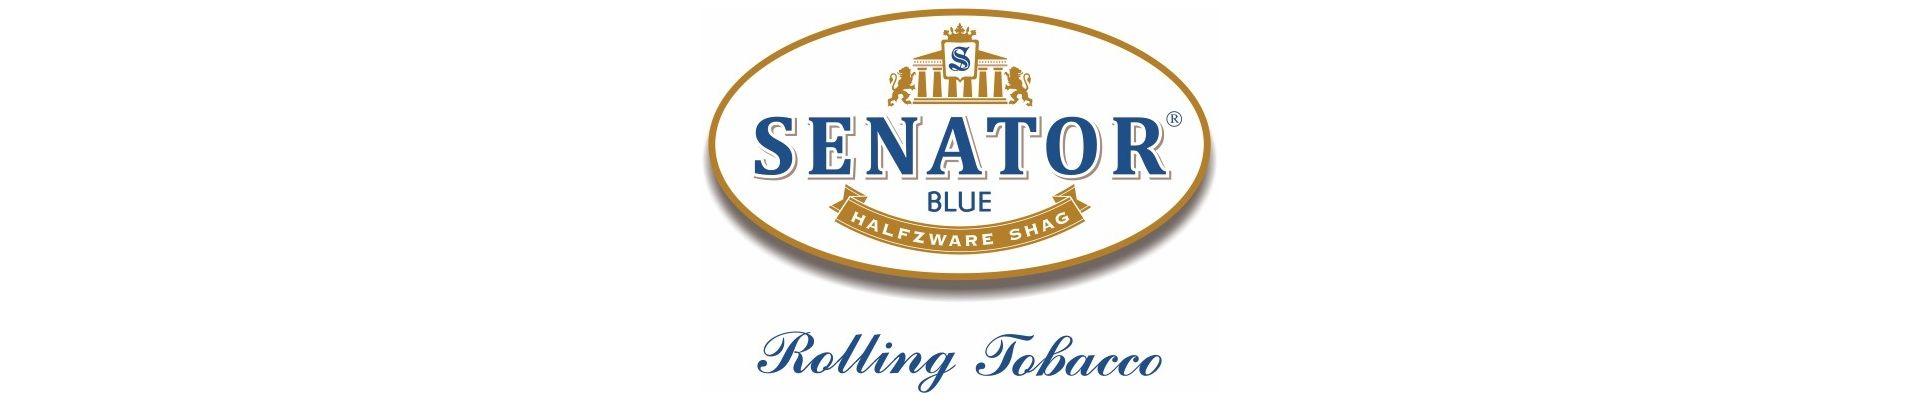 Tutun de rulat tigarete Senator de vanzare.Pachet tutun Senator pret